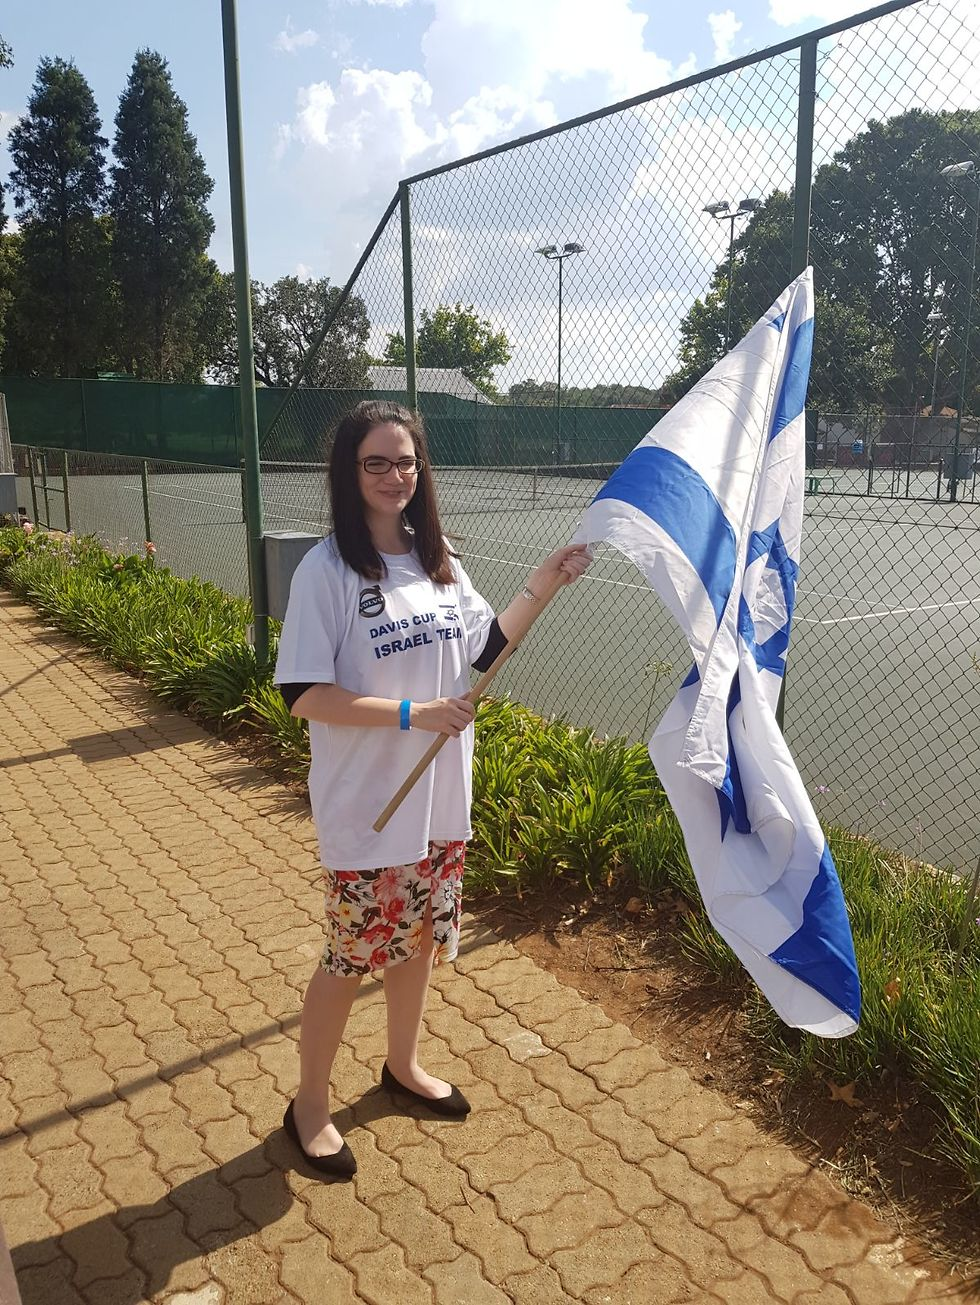 Deputy Ambassador Black defiantly waved the Israeli flag